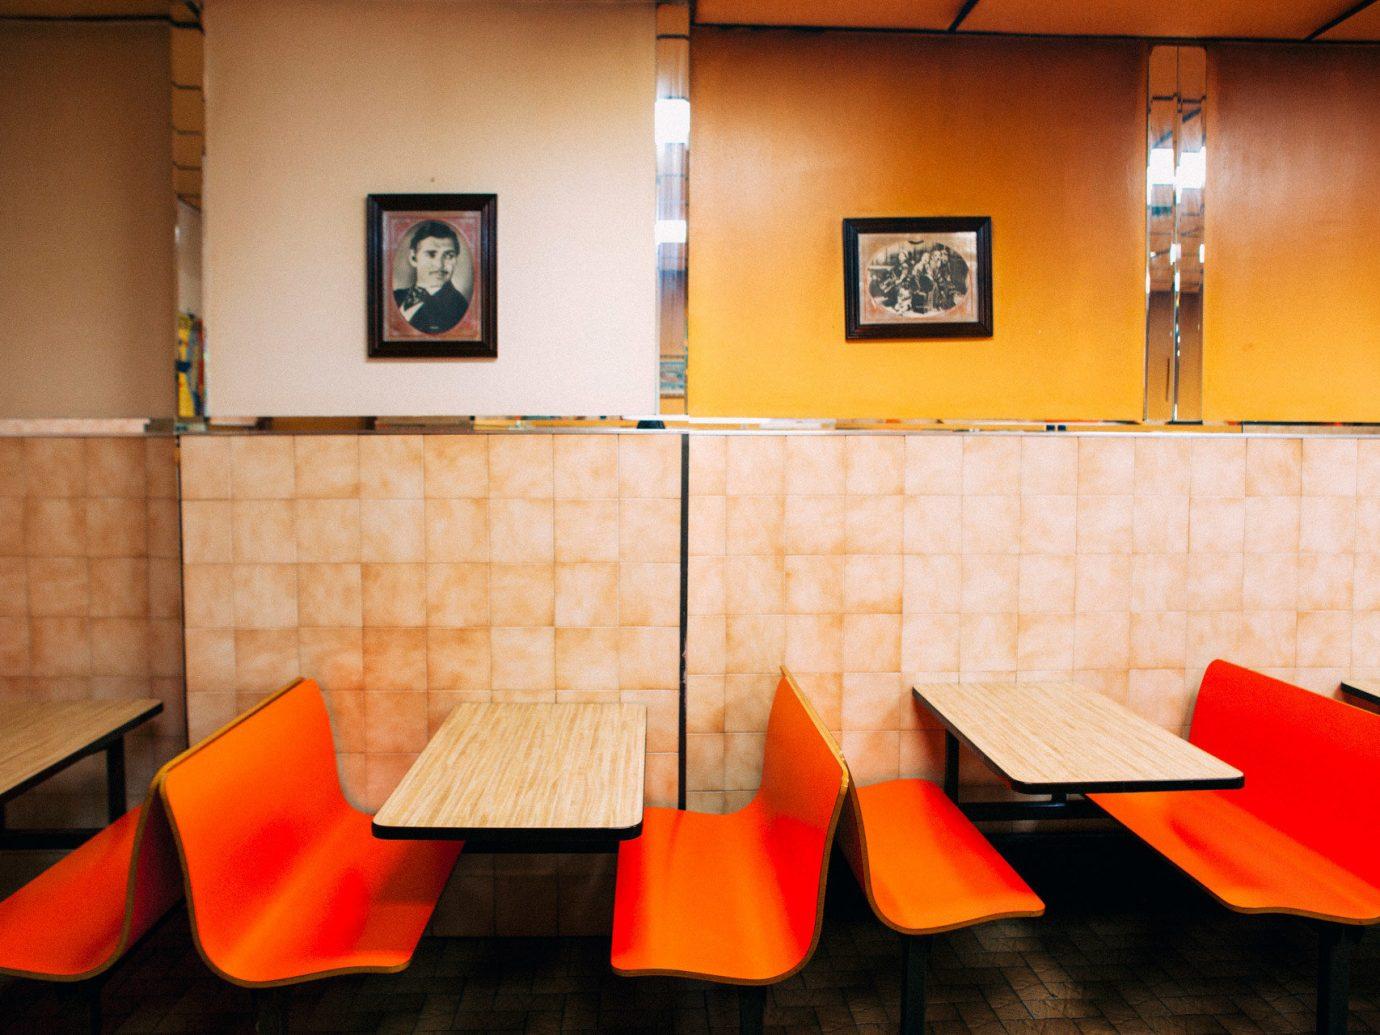 Food + Drink indoor wall floor color red orange room yellow interior design art Design restaurant furniture colored